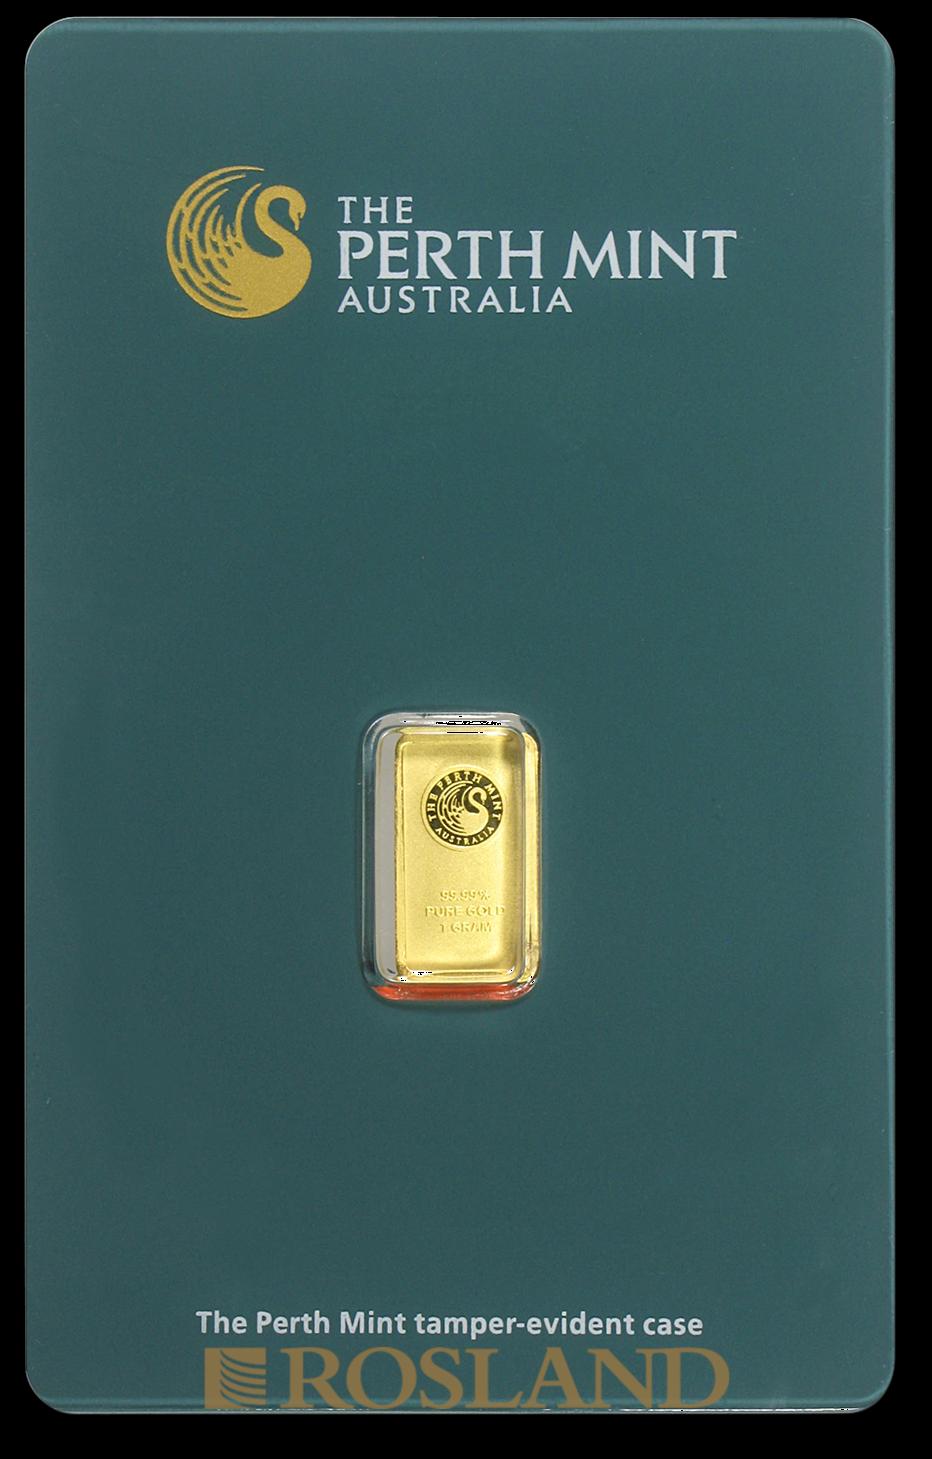 1 Gramm Goldbarren Perth Mint Classic